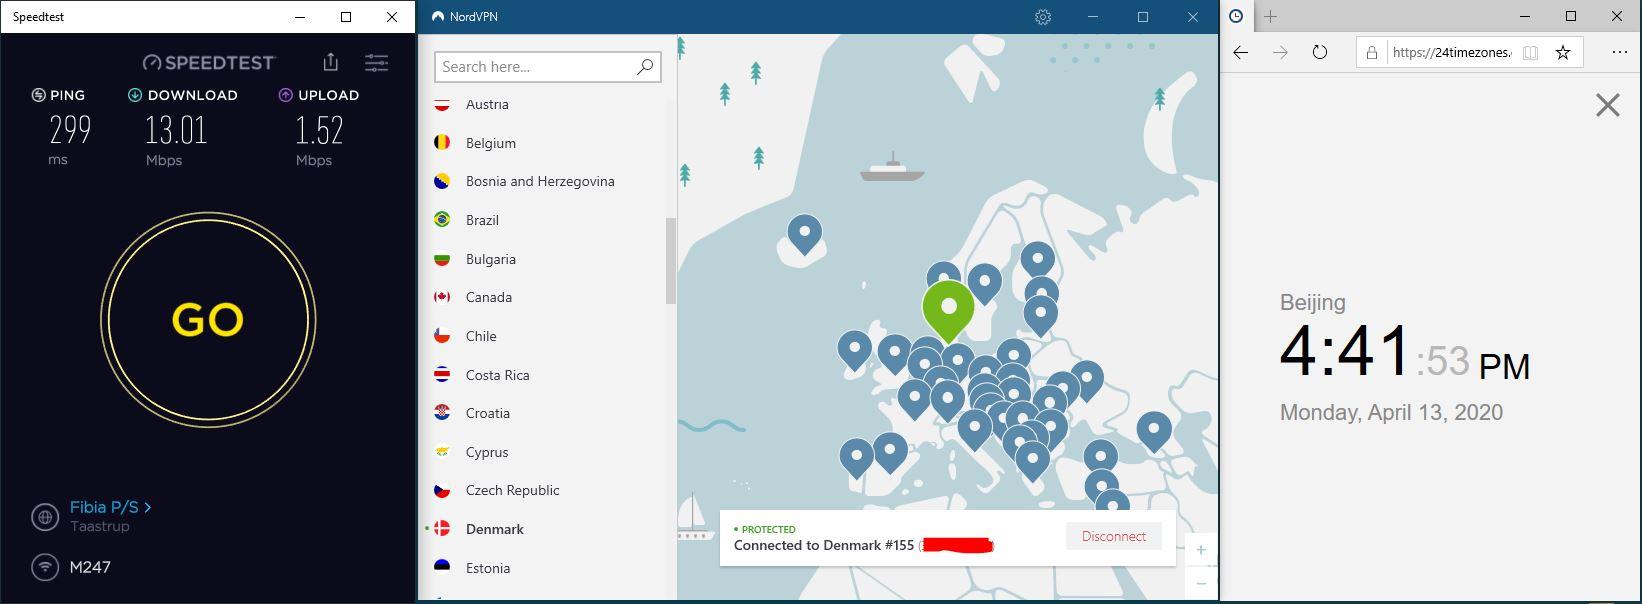 Windows10 NordVPN Denmark #155 中国VPN 翻墙 科学上网 SpeedTest测速-20200413